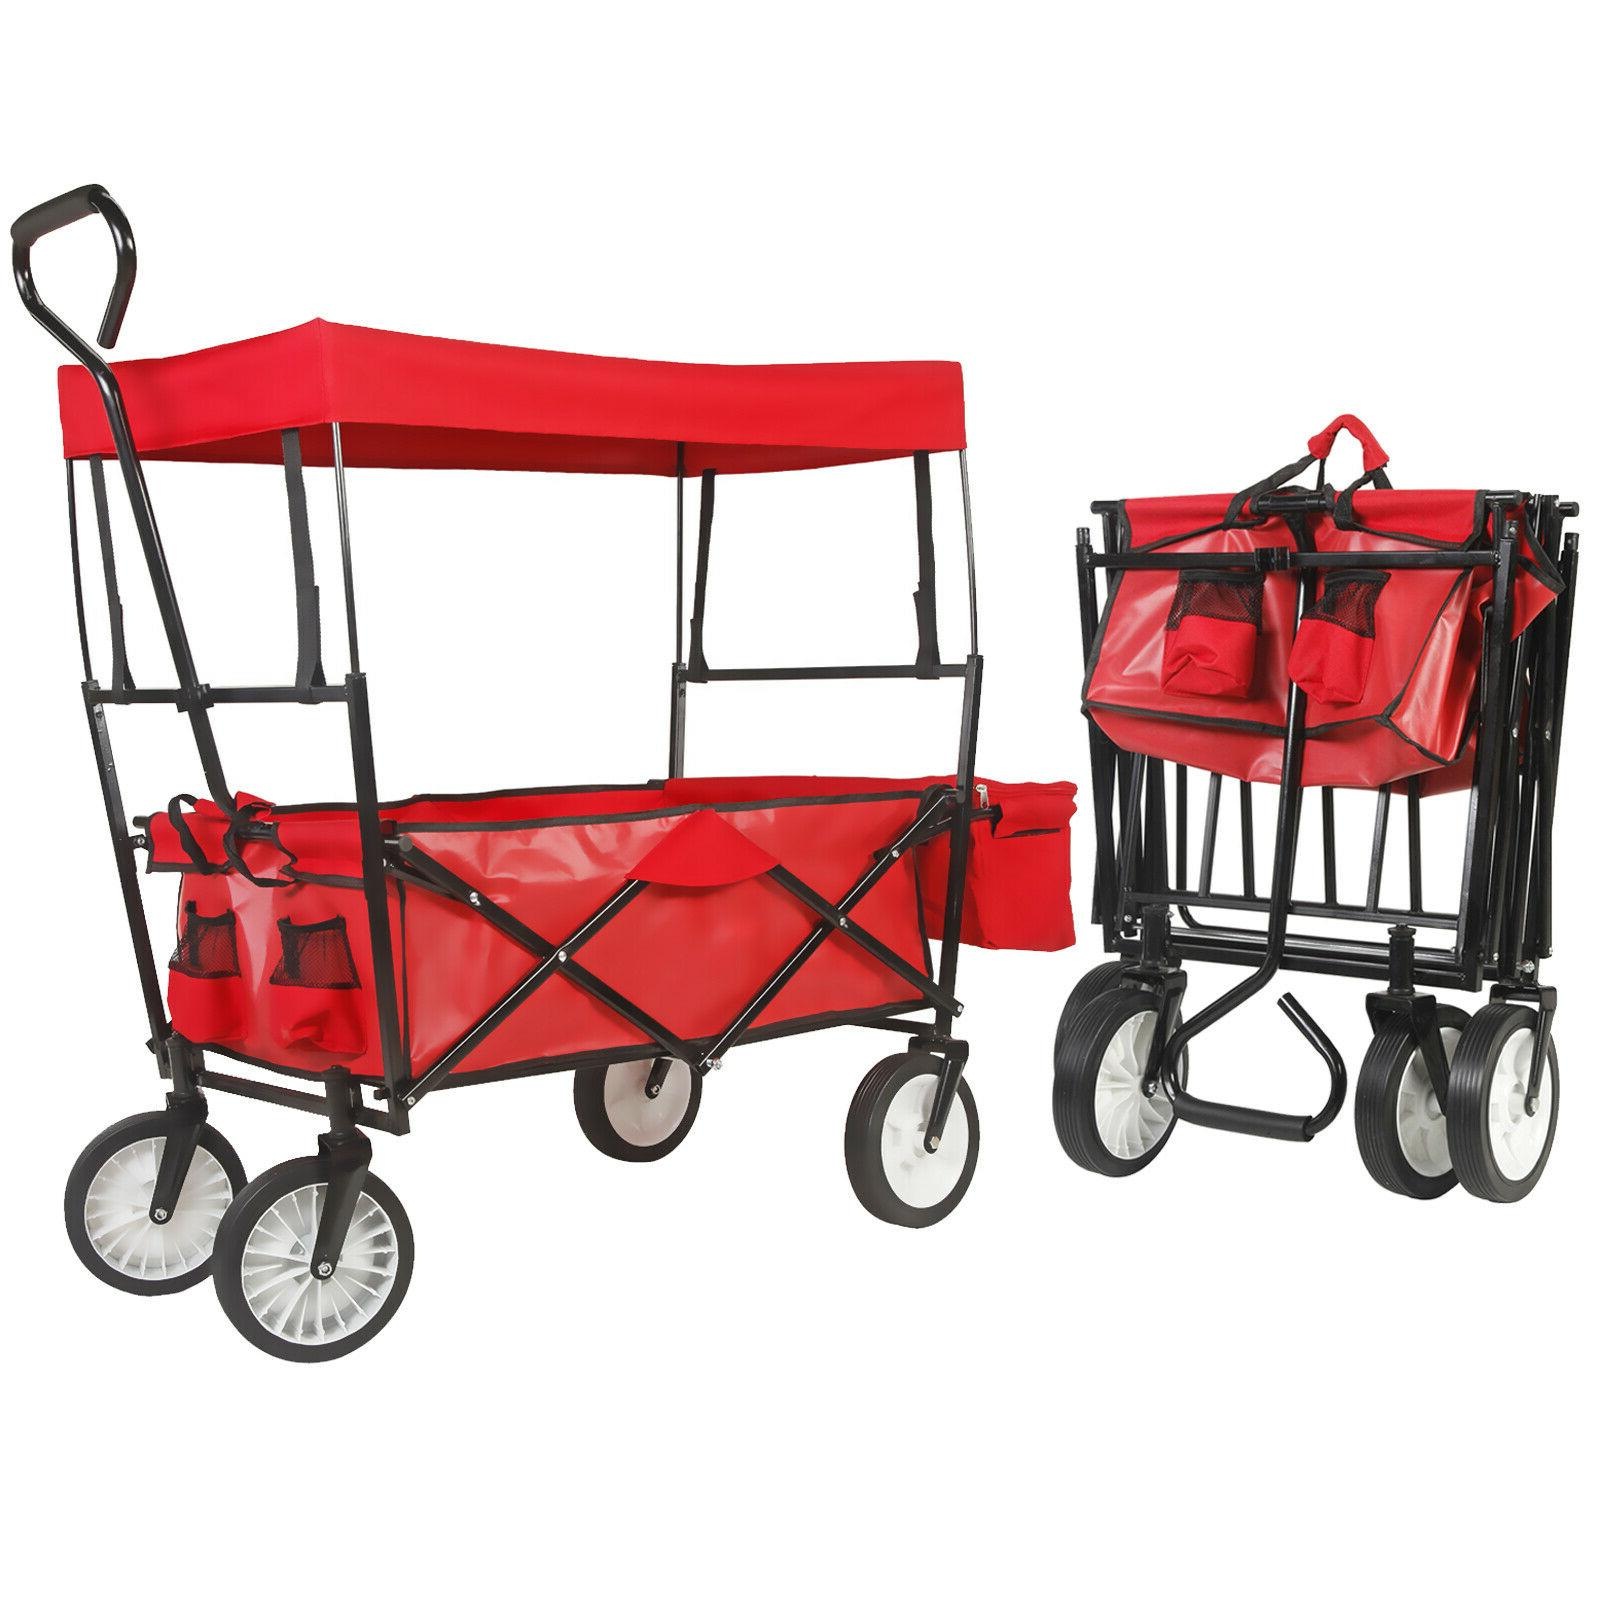 collapsible folding garden outdoor camping utility wagon